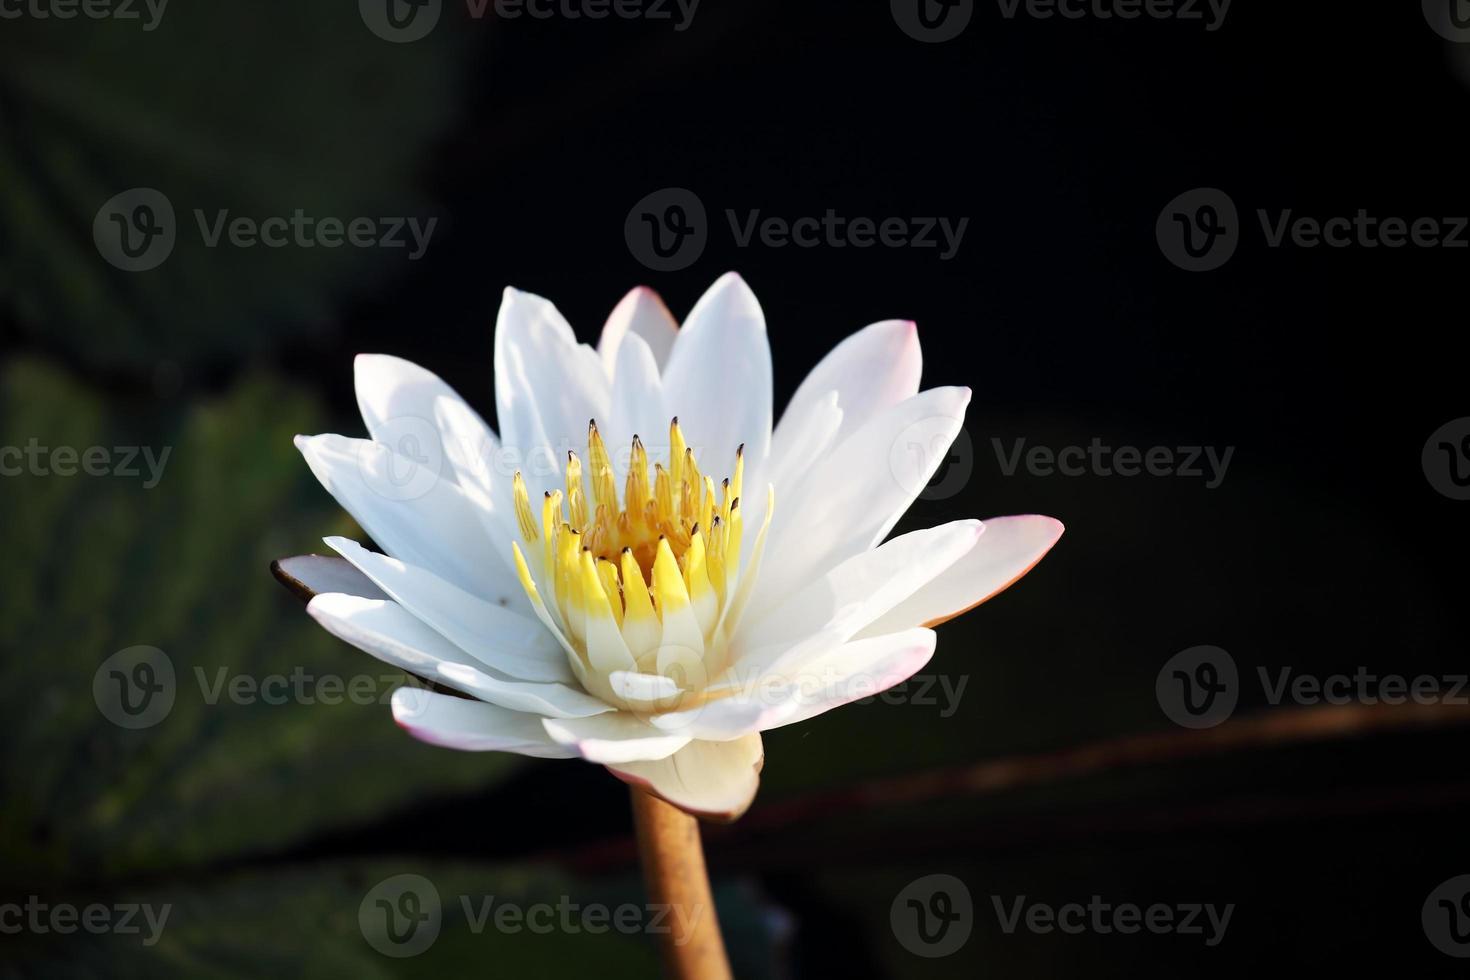 fiore di loto bianco foto